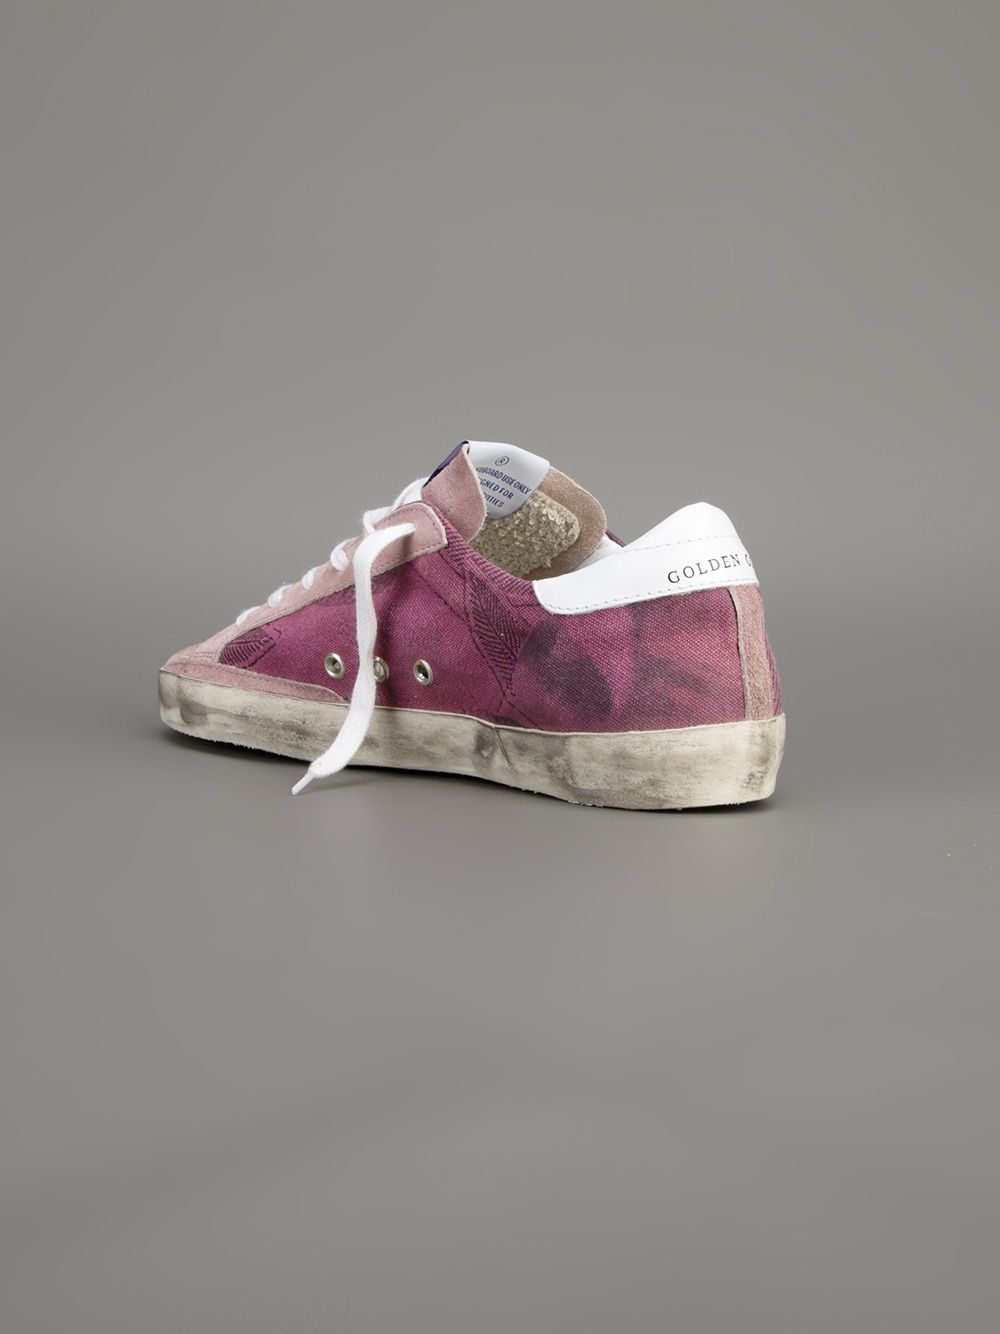 Golden Goose Deluxe Brand Superstar Trainer in Lilac (Pink)